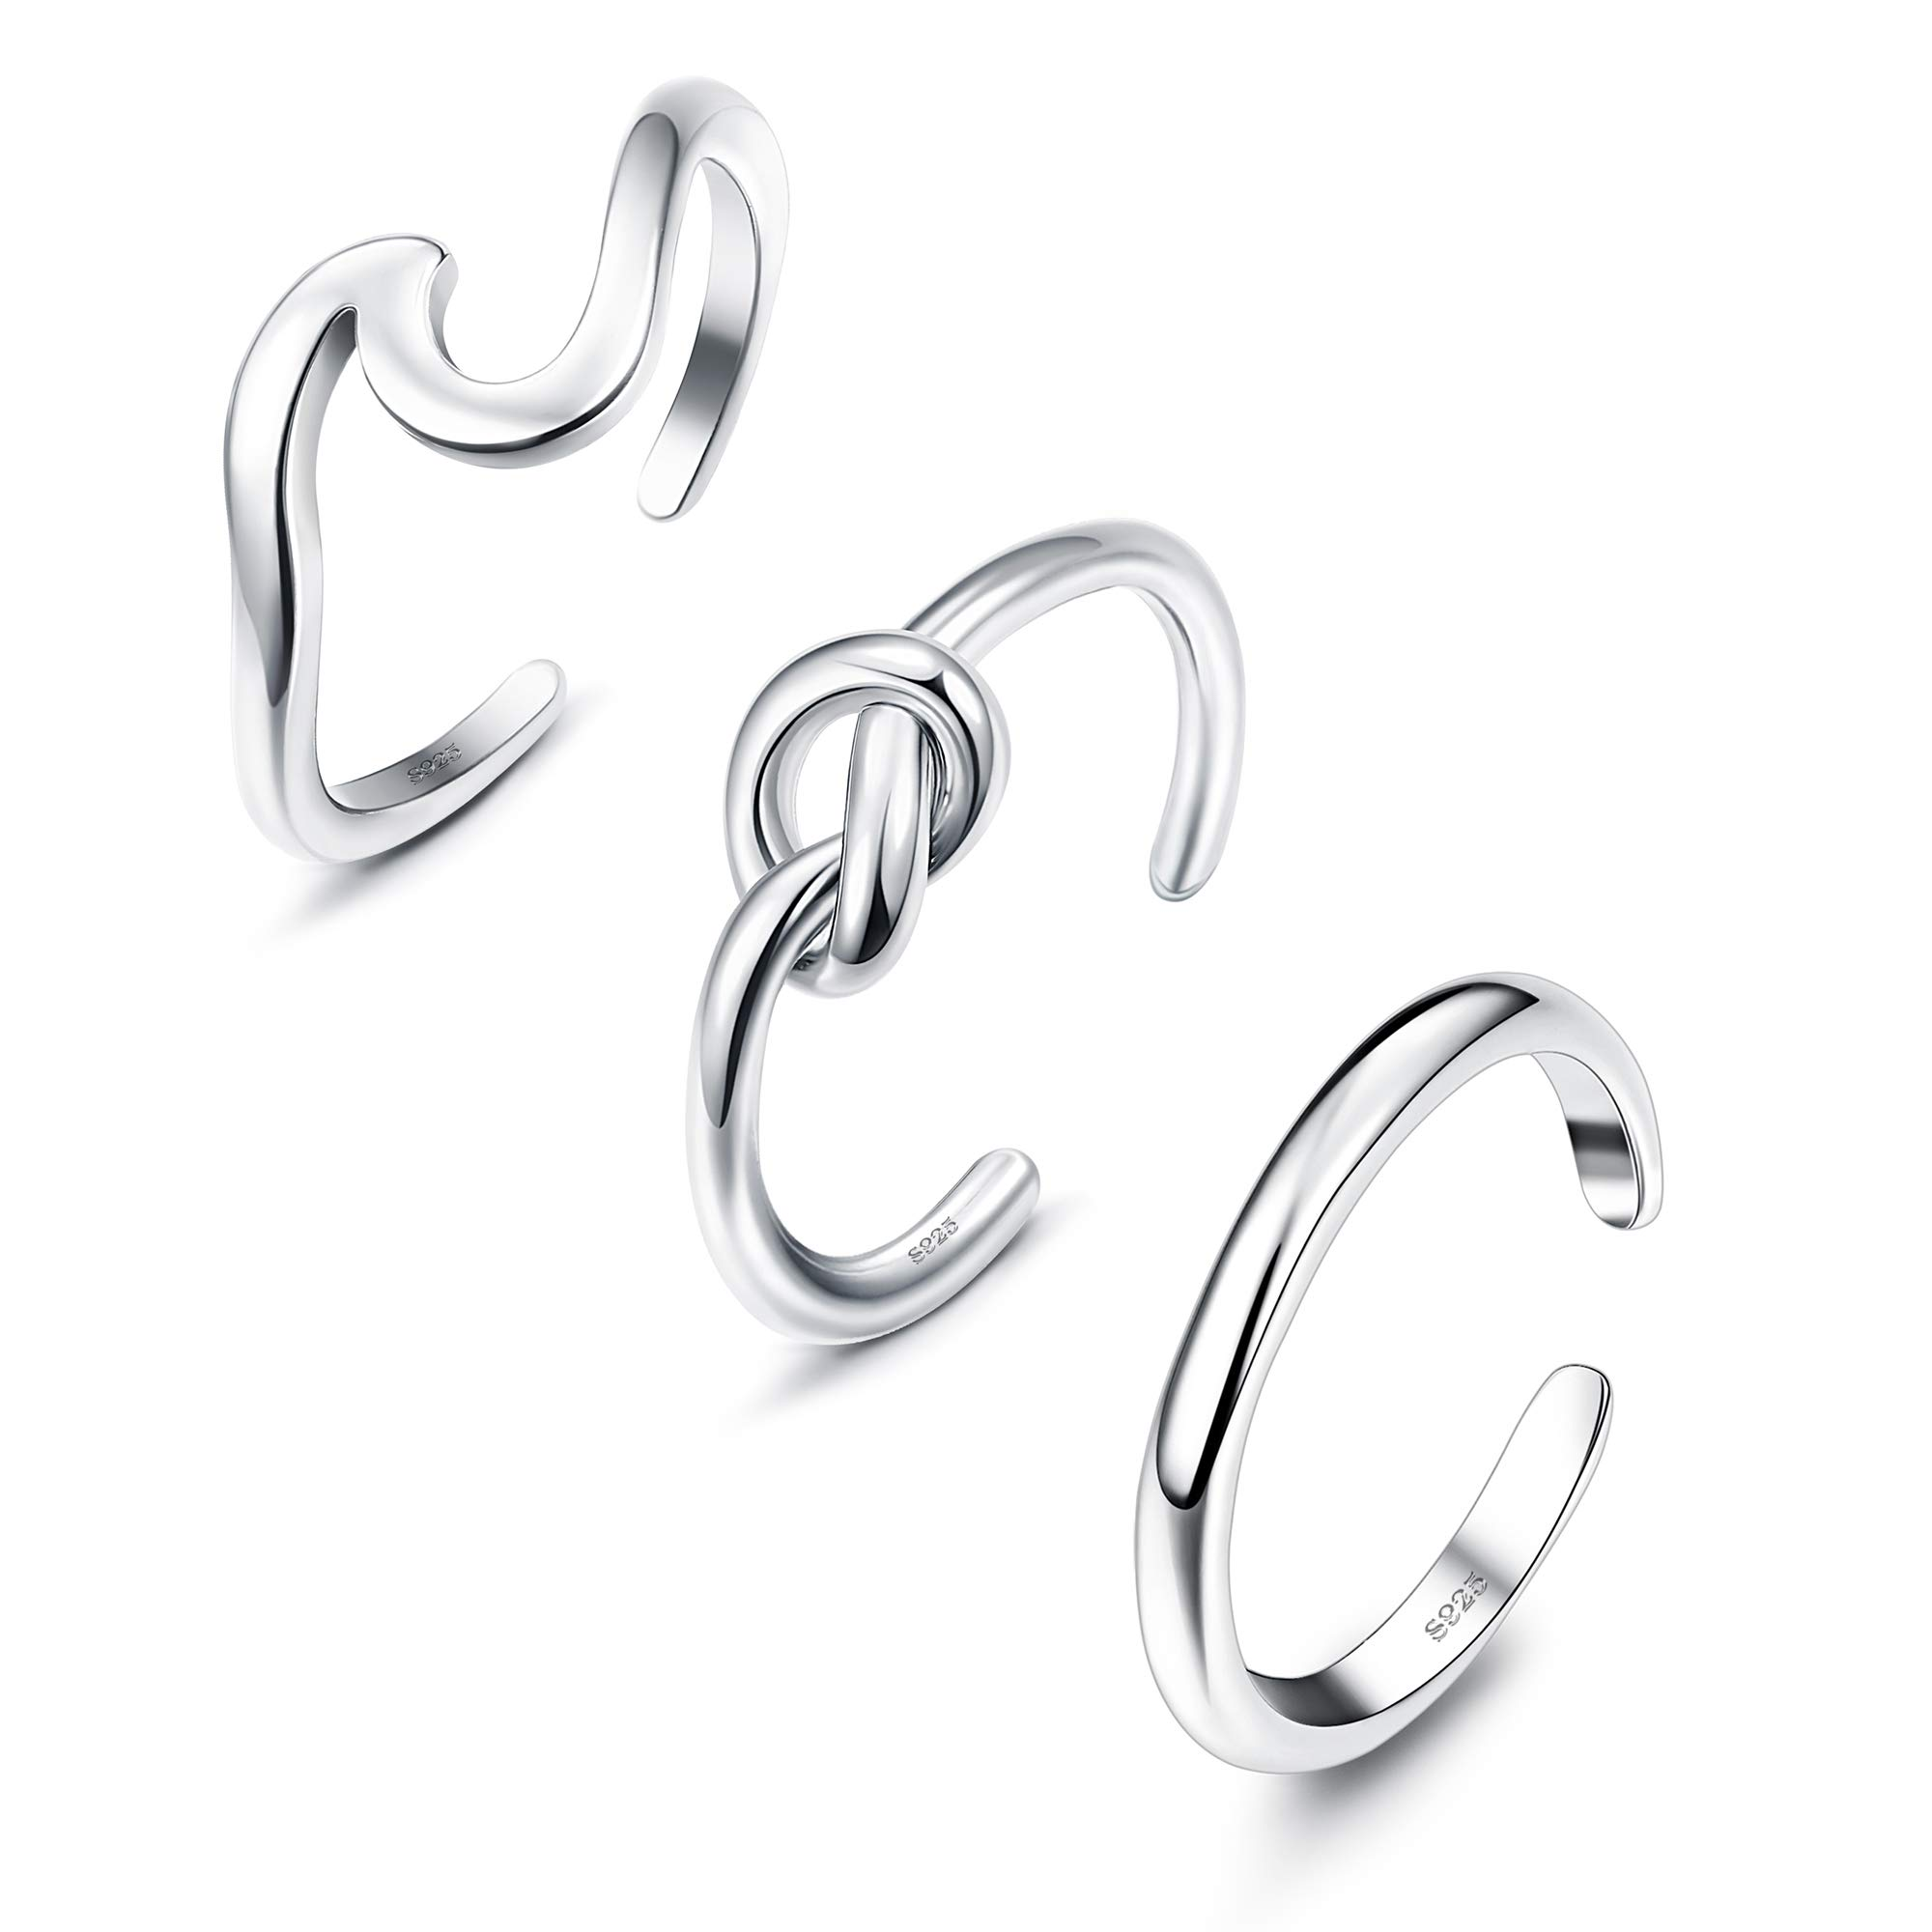 JOERICA 3PCS 925 Sterling Silver Toe Ring for Women Girls Adjustable Minimalism Wave Arrow Band Toe Rings Set Foot Jewelry by JOERICA